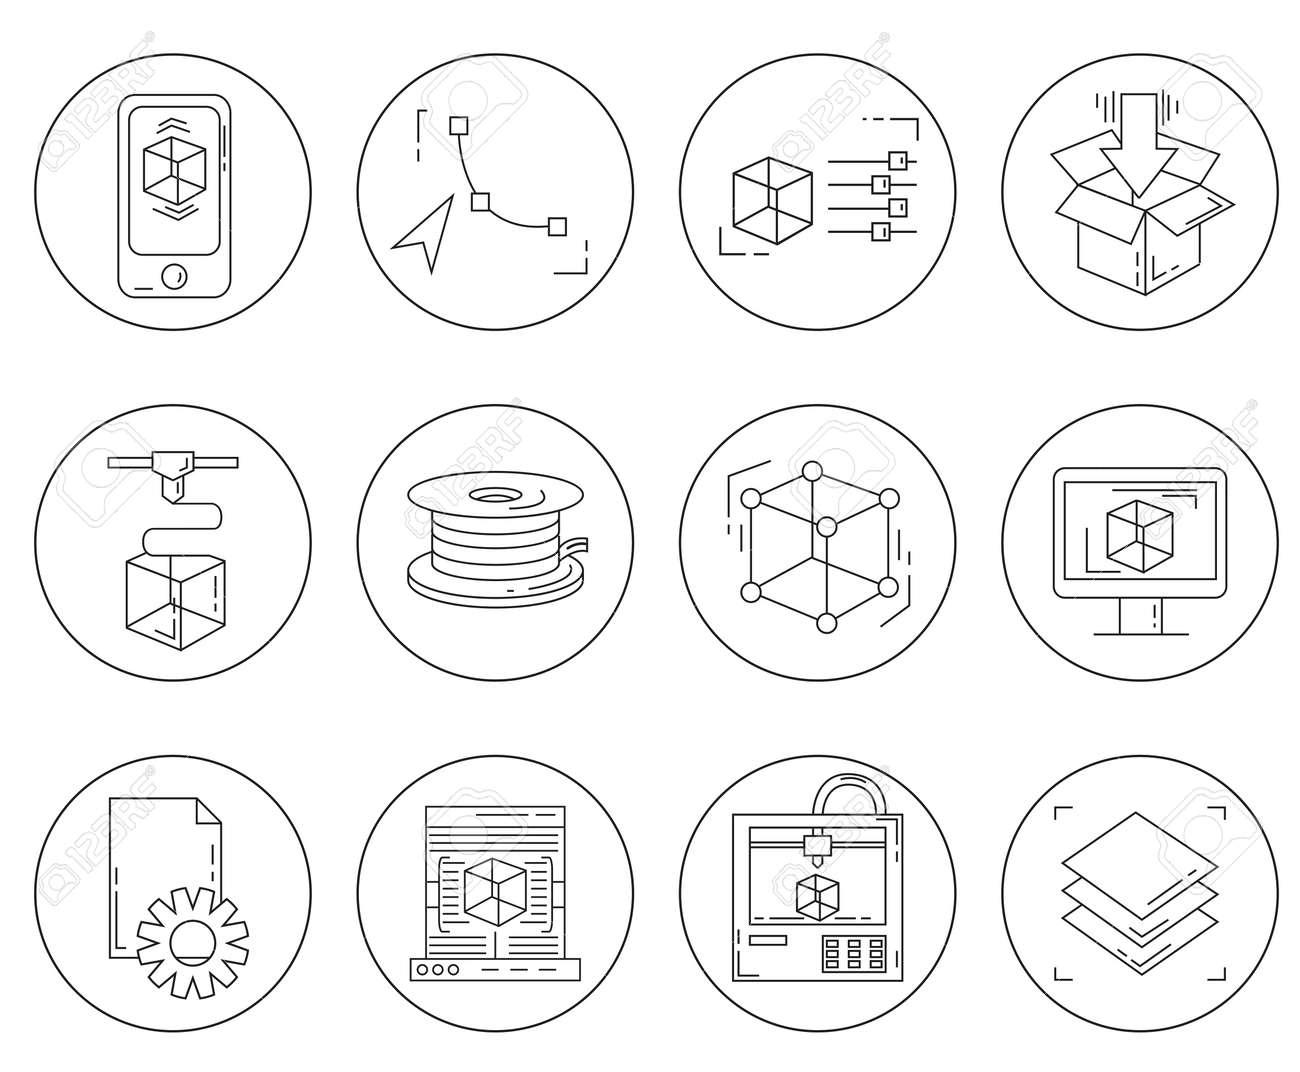 3d print icons set vector collection of printing symbols in 3d print icons set vector collection of printing symbols in thin line style stock vector buycottarizona Choice Image